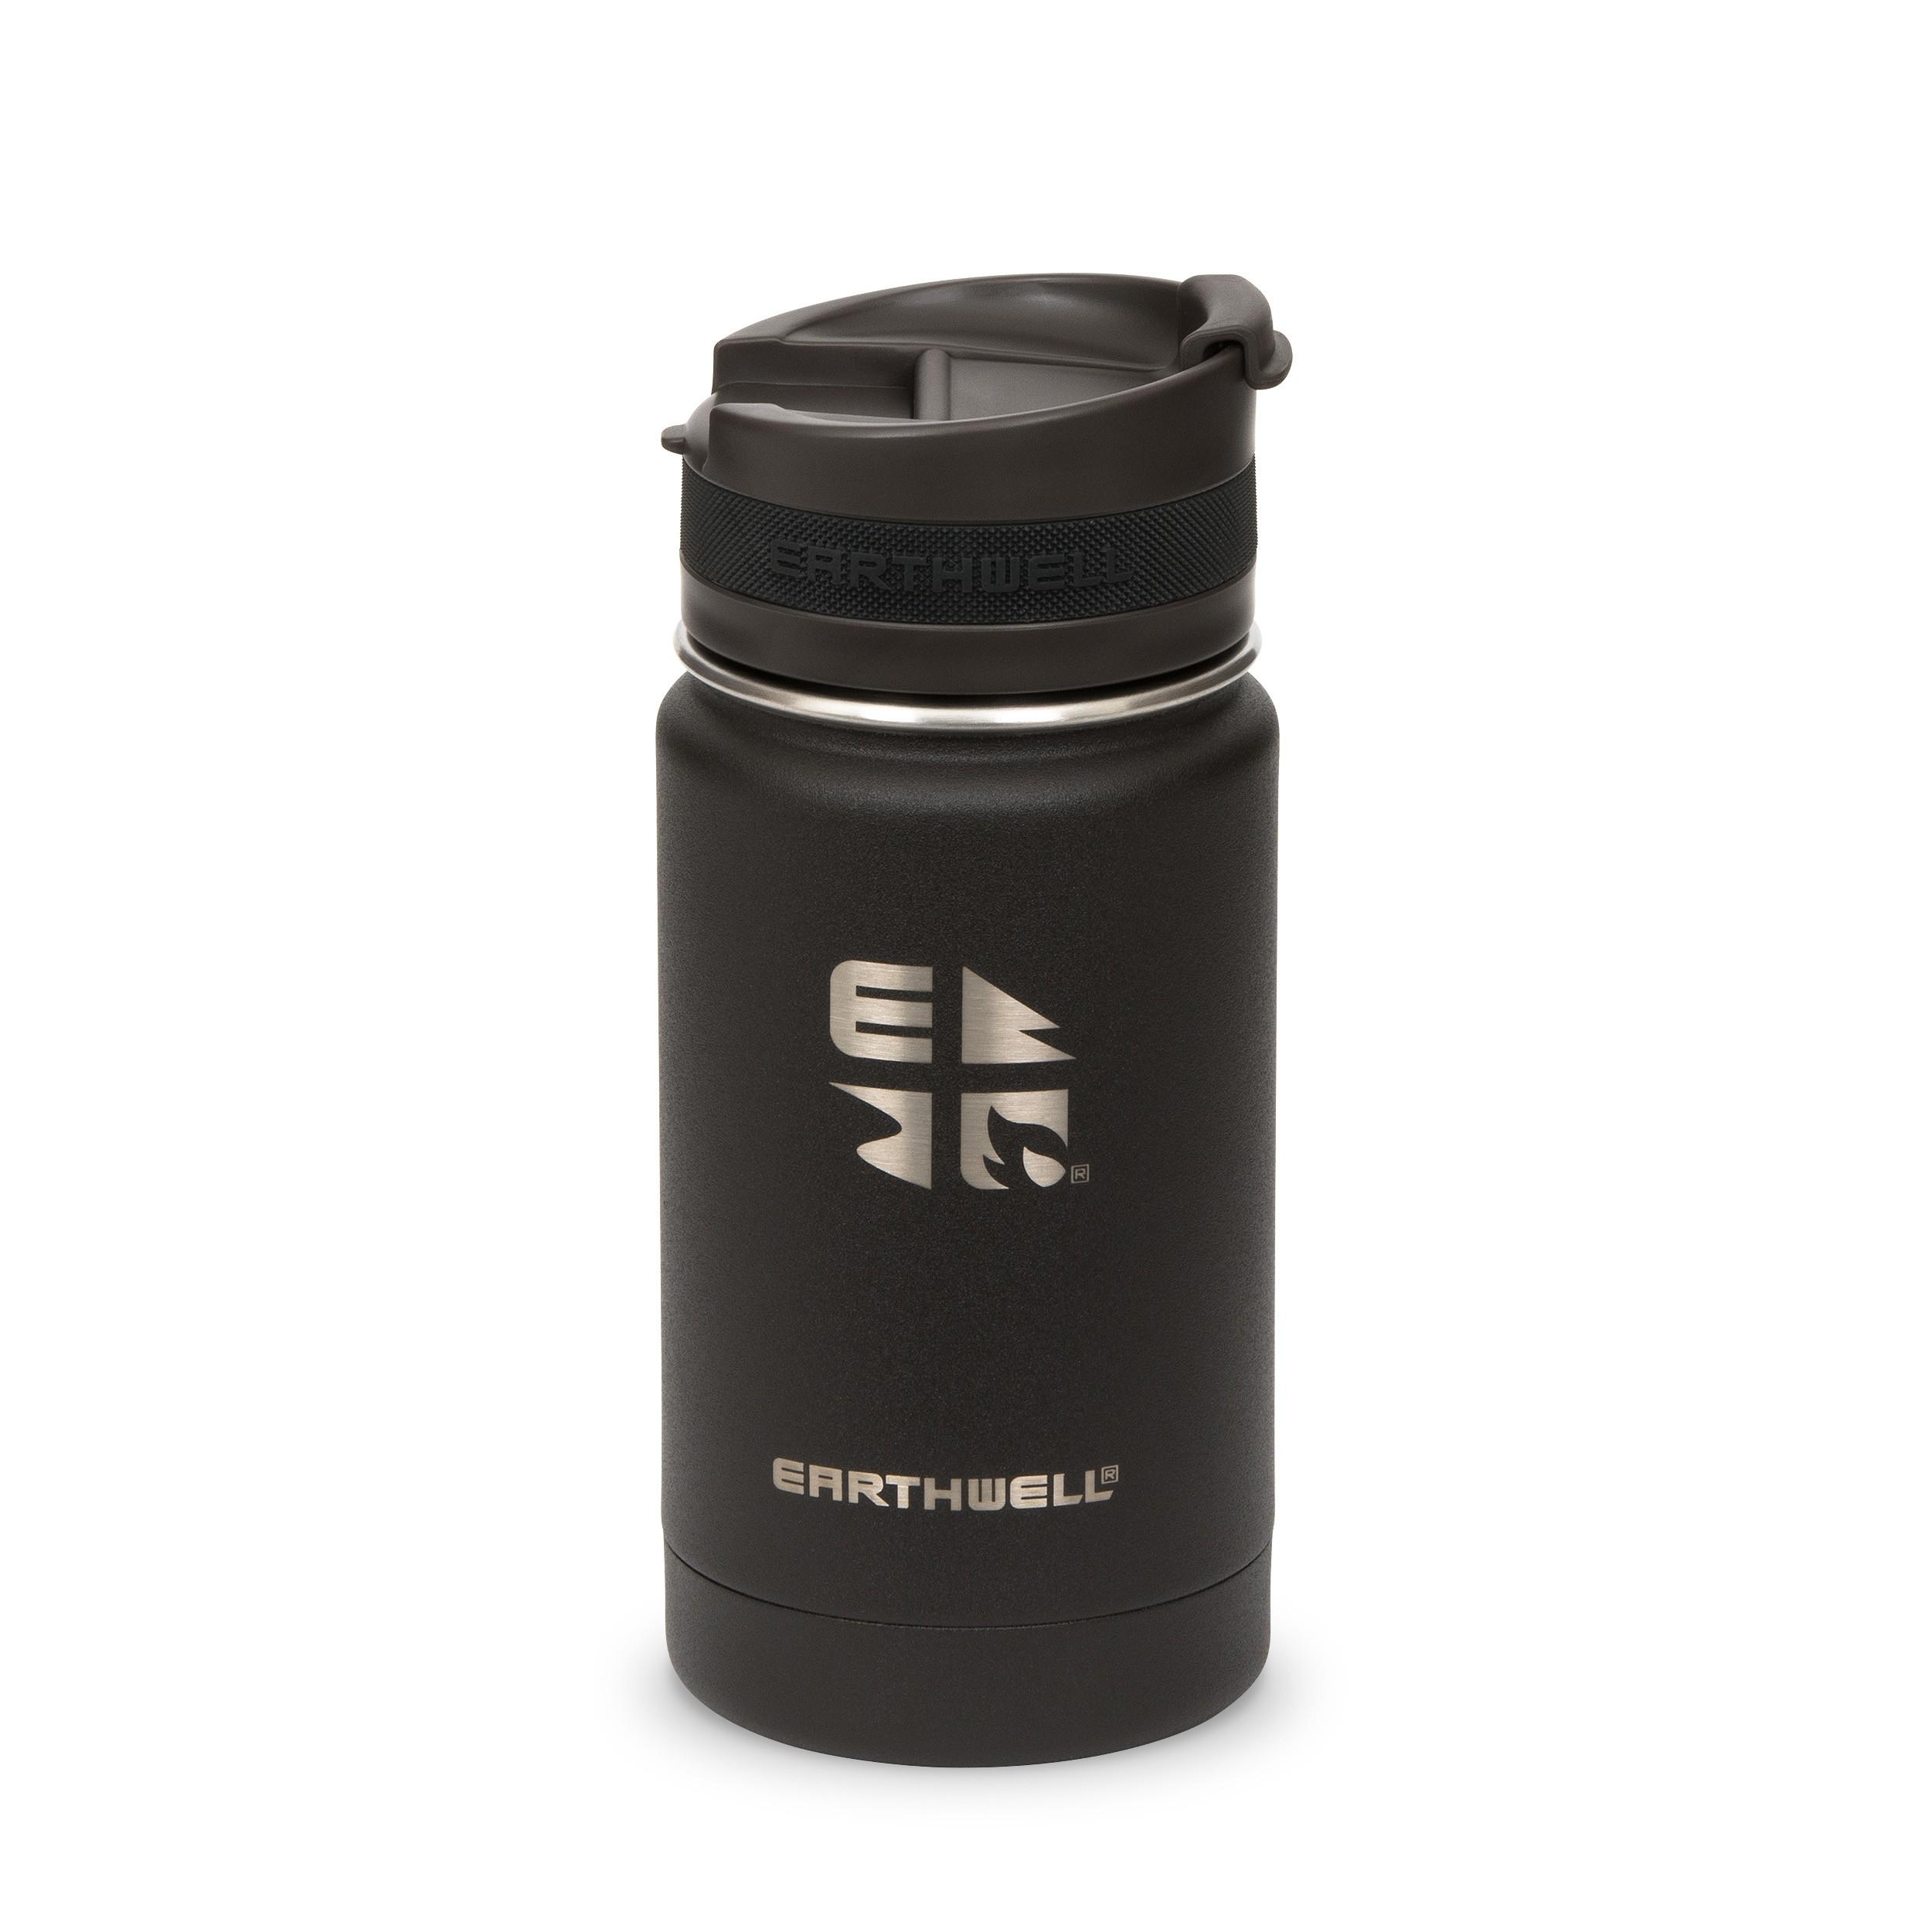 Earthwell 12oz Roaster Loop Bottle